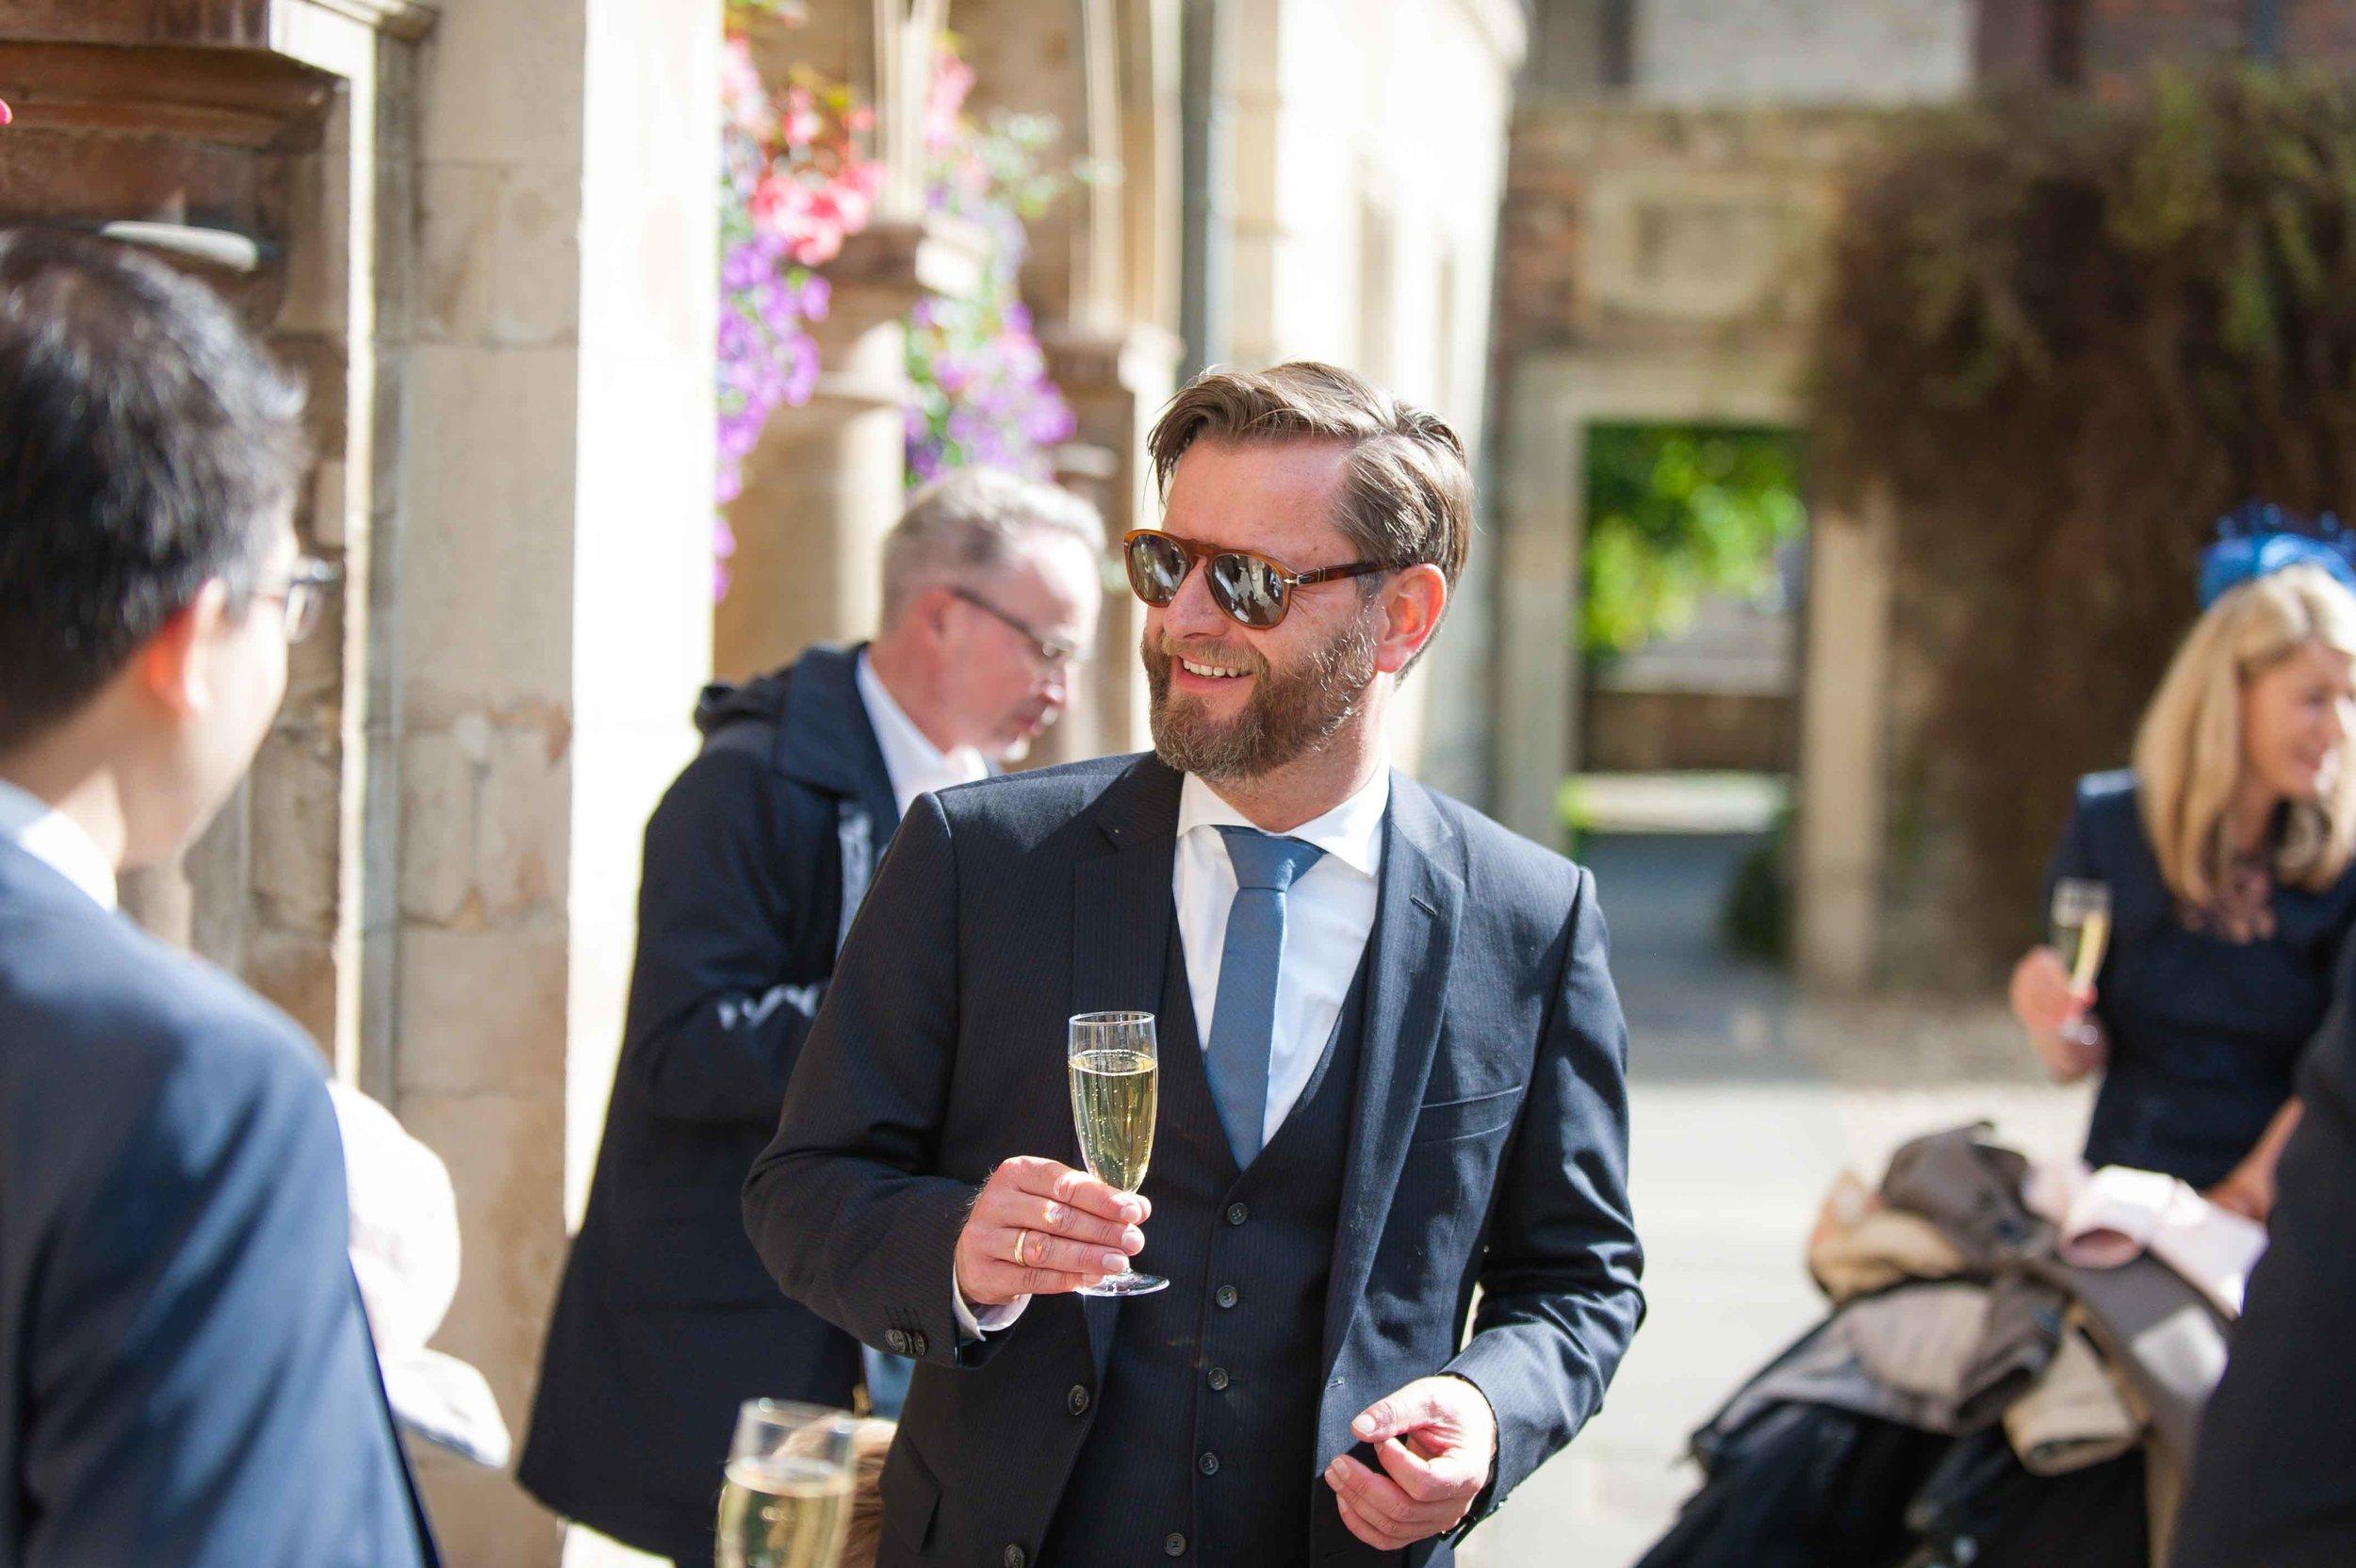 Adrian_Nicole_Charnwood_Weddings_Queens_College_Cambridge-1052.jpg